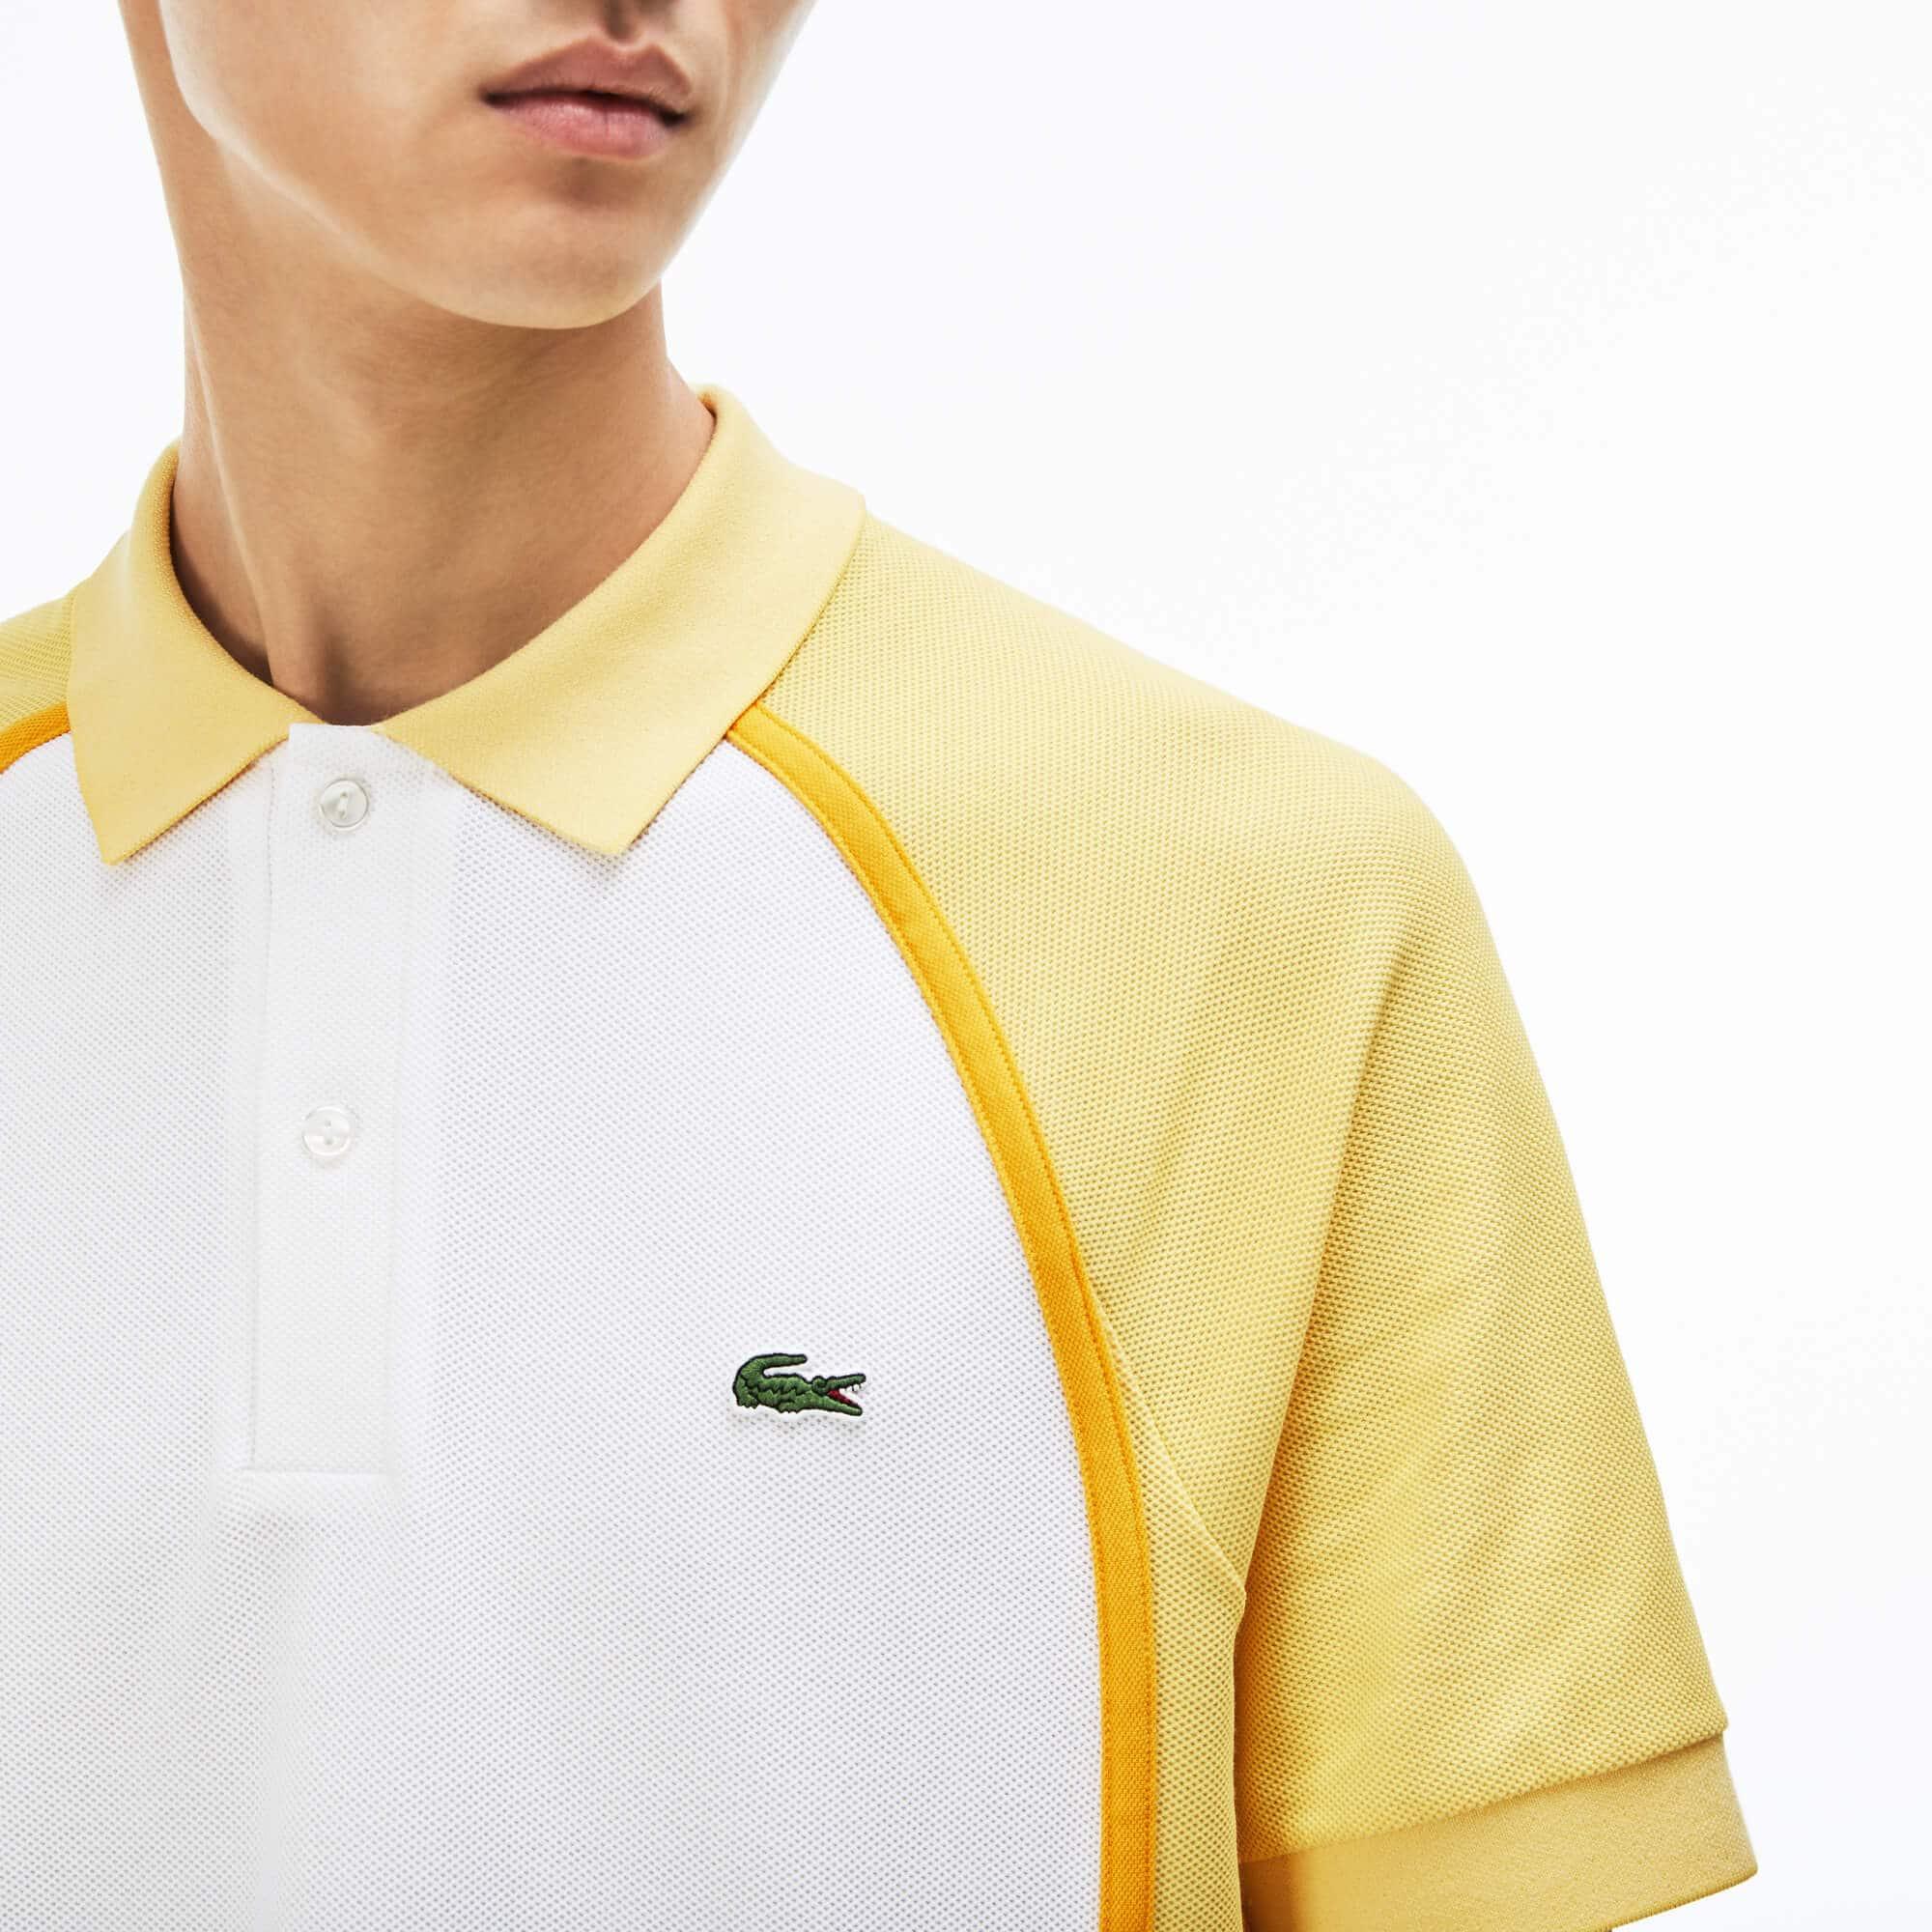 b3b533468793f Camisa Polo Lacoste Made in France Regular Fit Masculina em Piqué Técnico  com ...